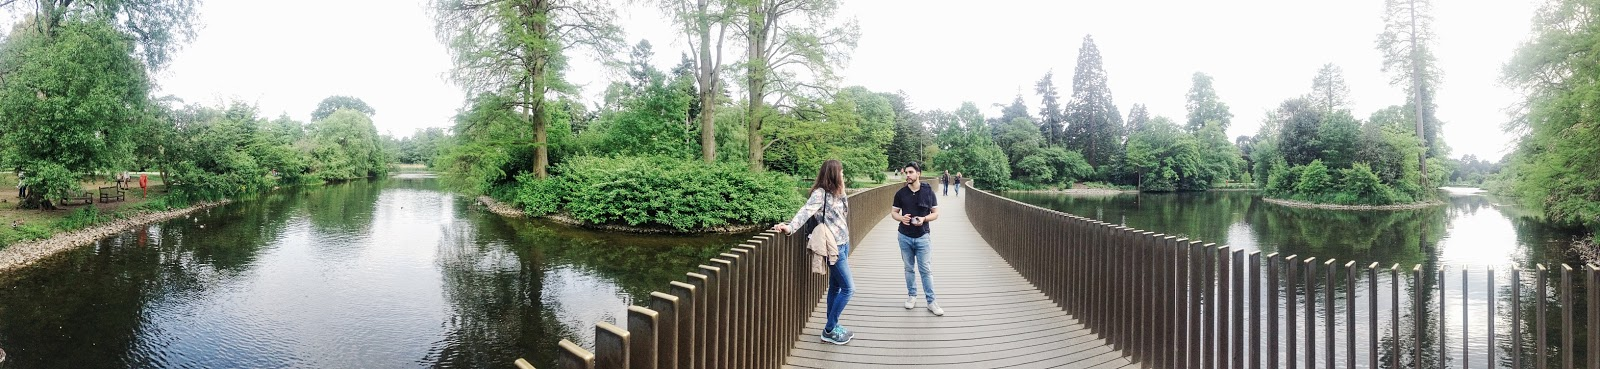 Kew Gardens bridge